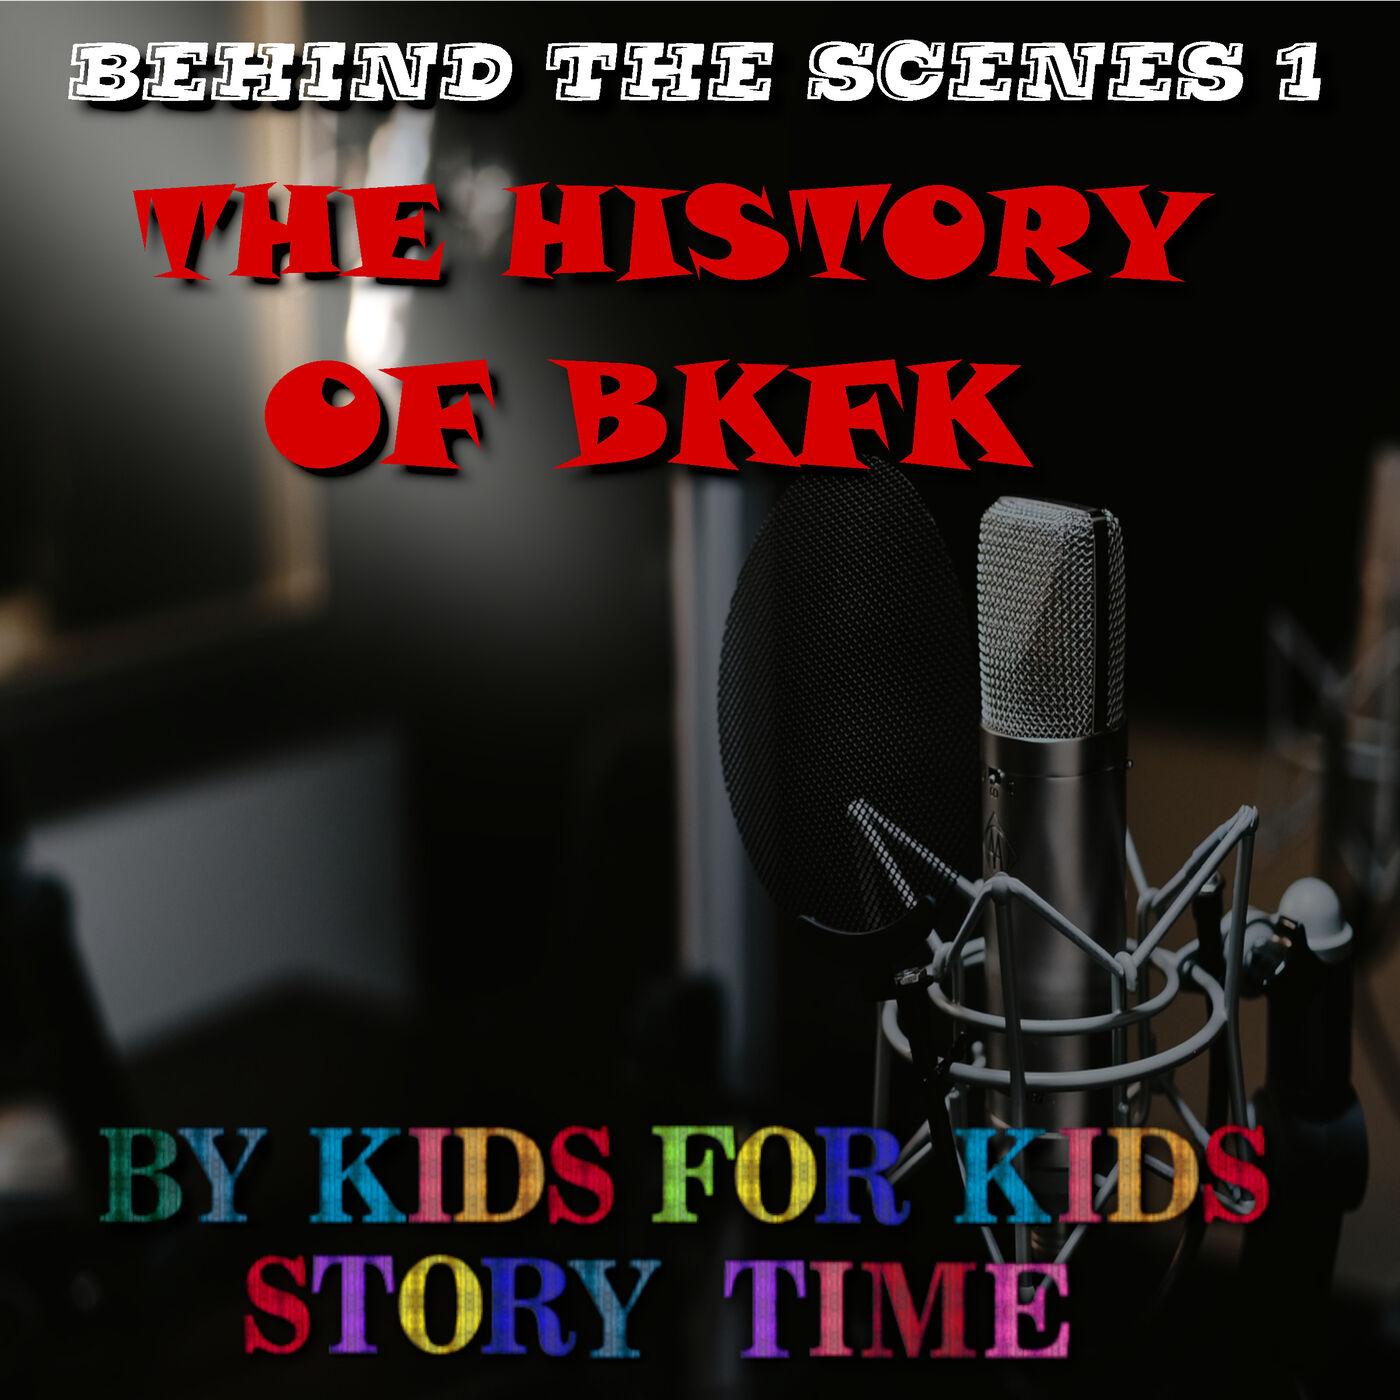 The History of BKFK - Behind the Scenes 1